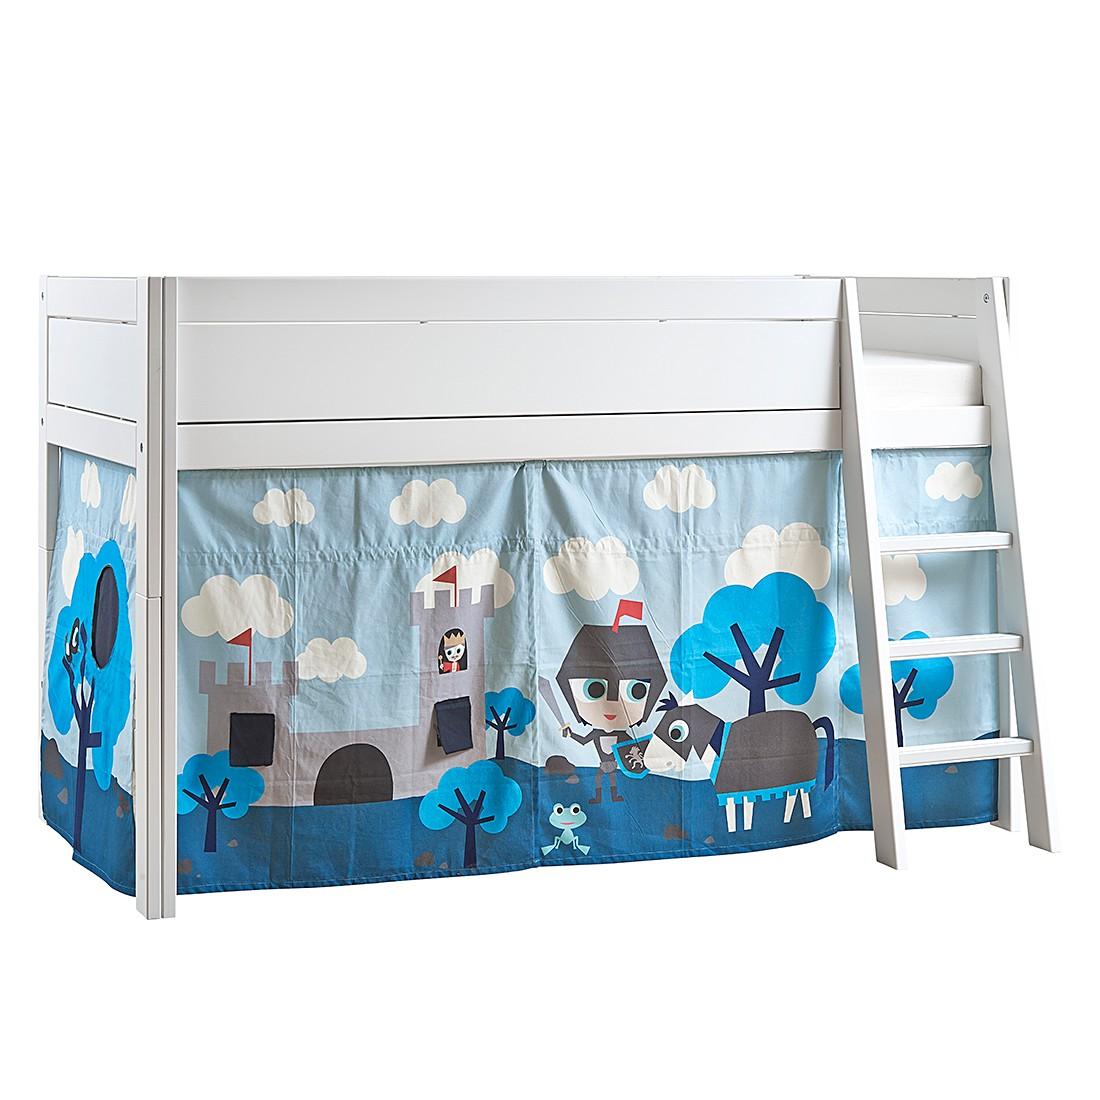 Halbhohes Bett Lifetime Original - Kiefer teilmassiv/Textil - Weiß/Blau - Mit Deluxe Lattenrost, Lifetime Kidsrooms